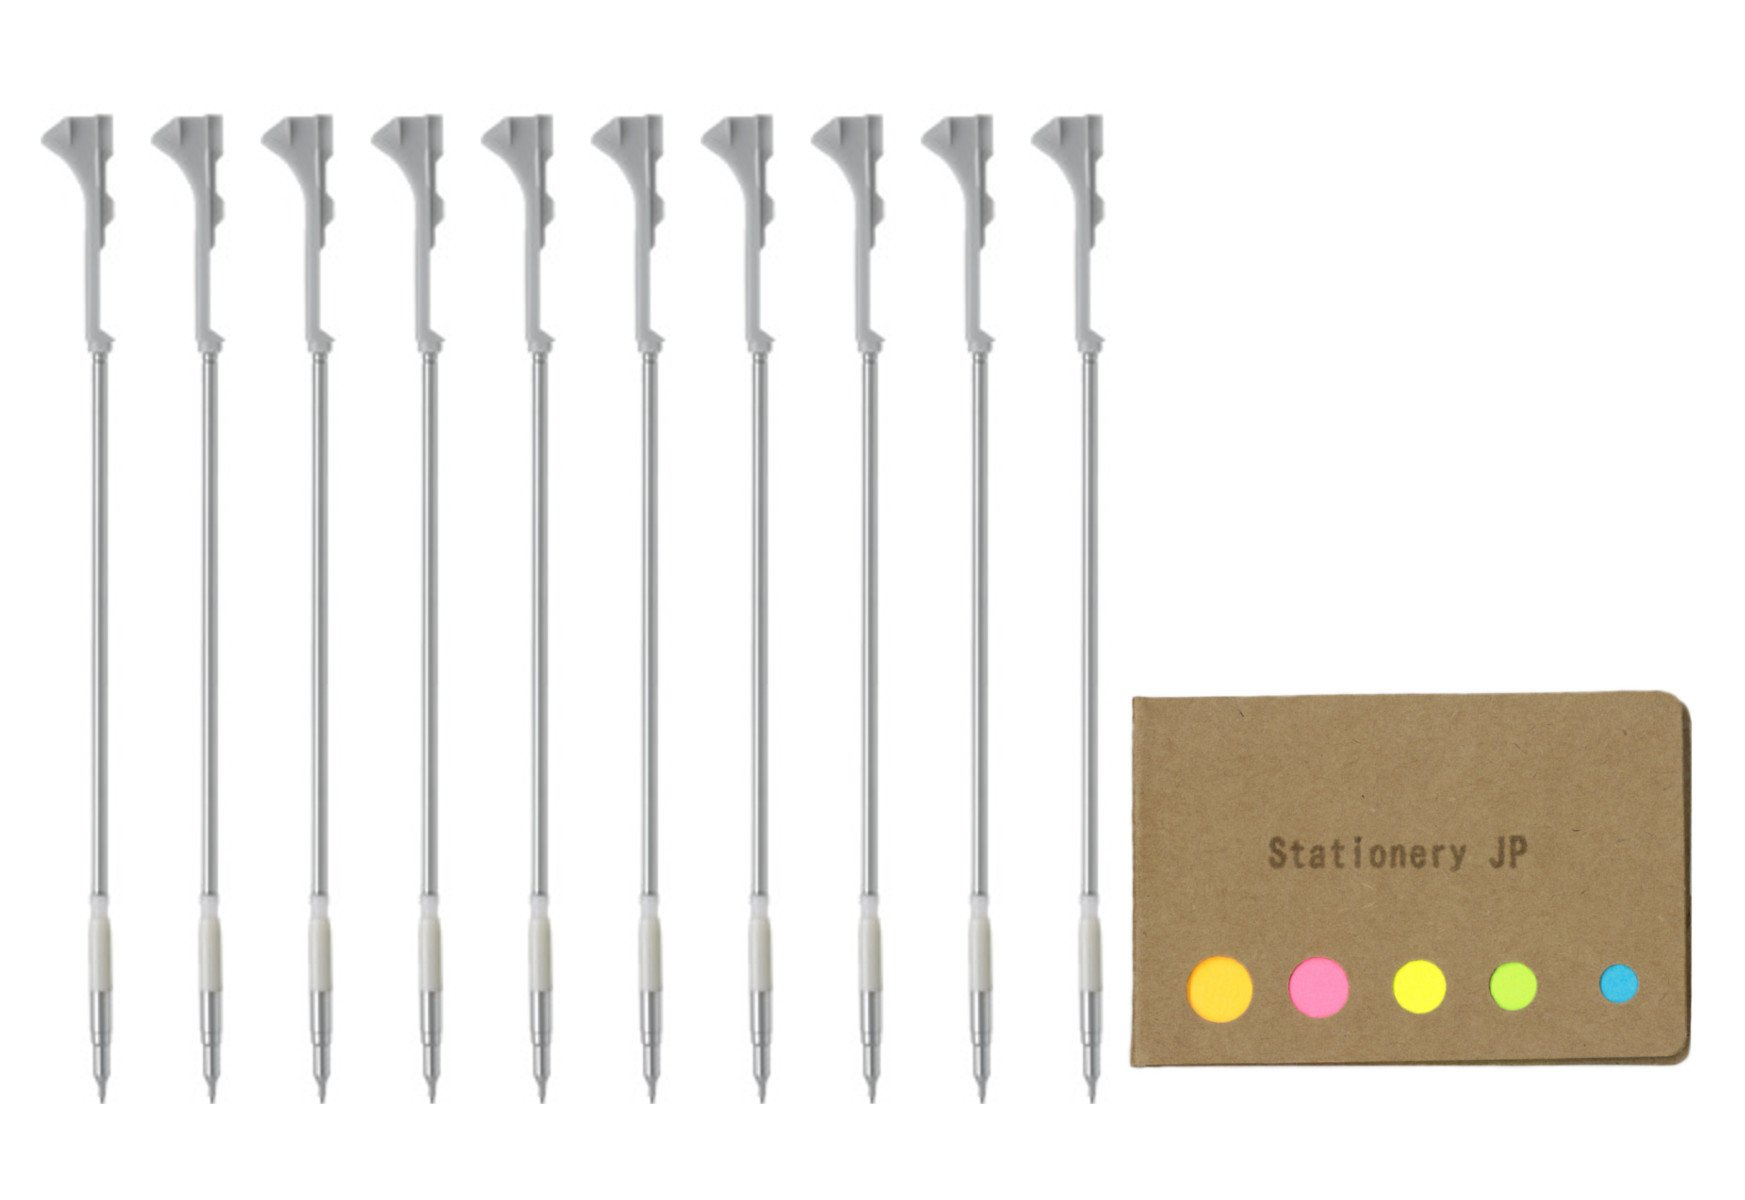 Pilot Hi-tec-c Coleto, Mechanical Pencil Unit for 0.5mm Lead, 10-pack, Sticky Notes Value Set